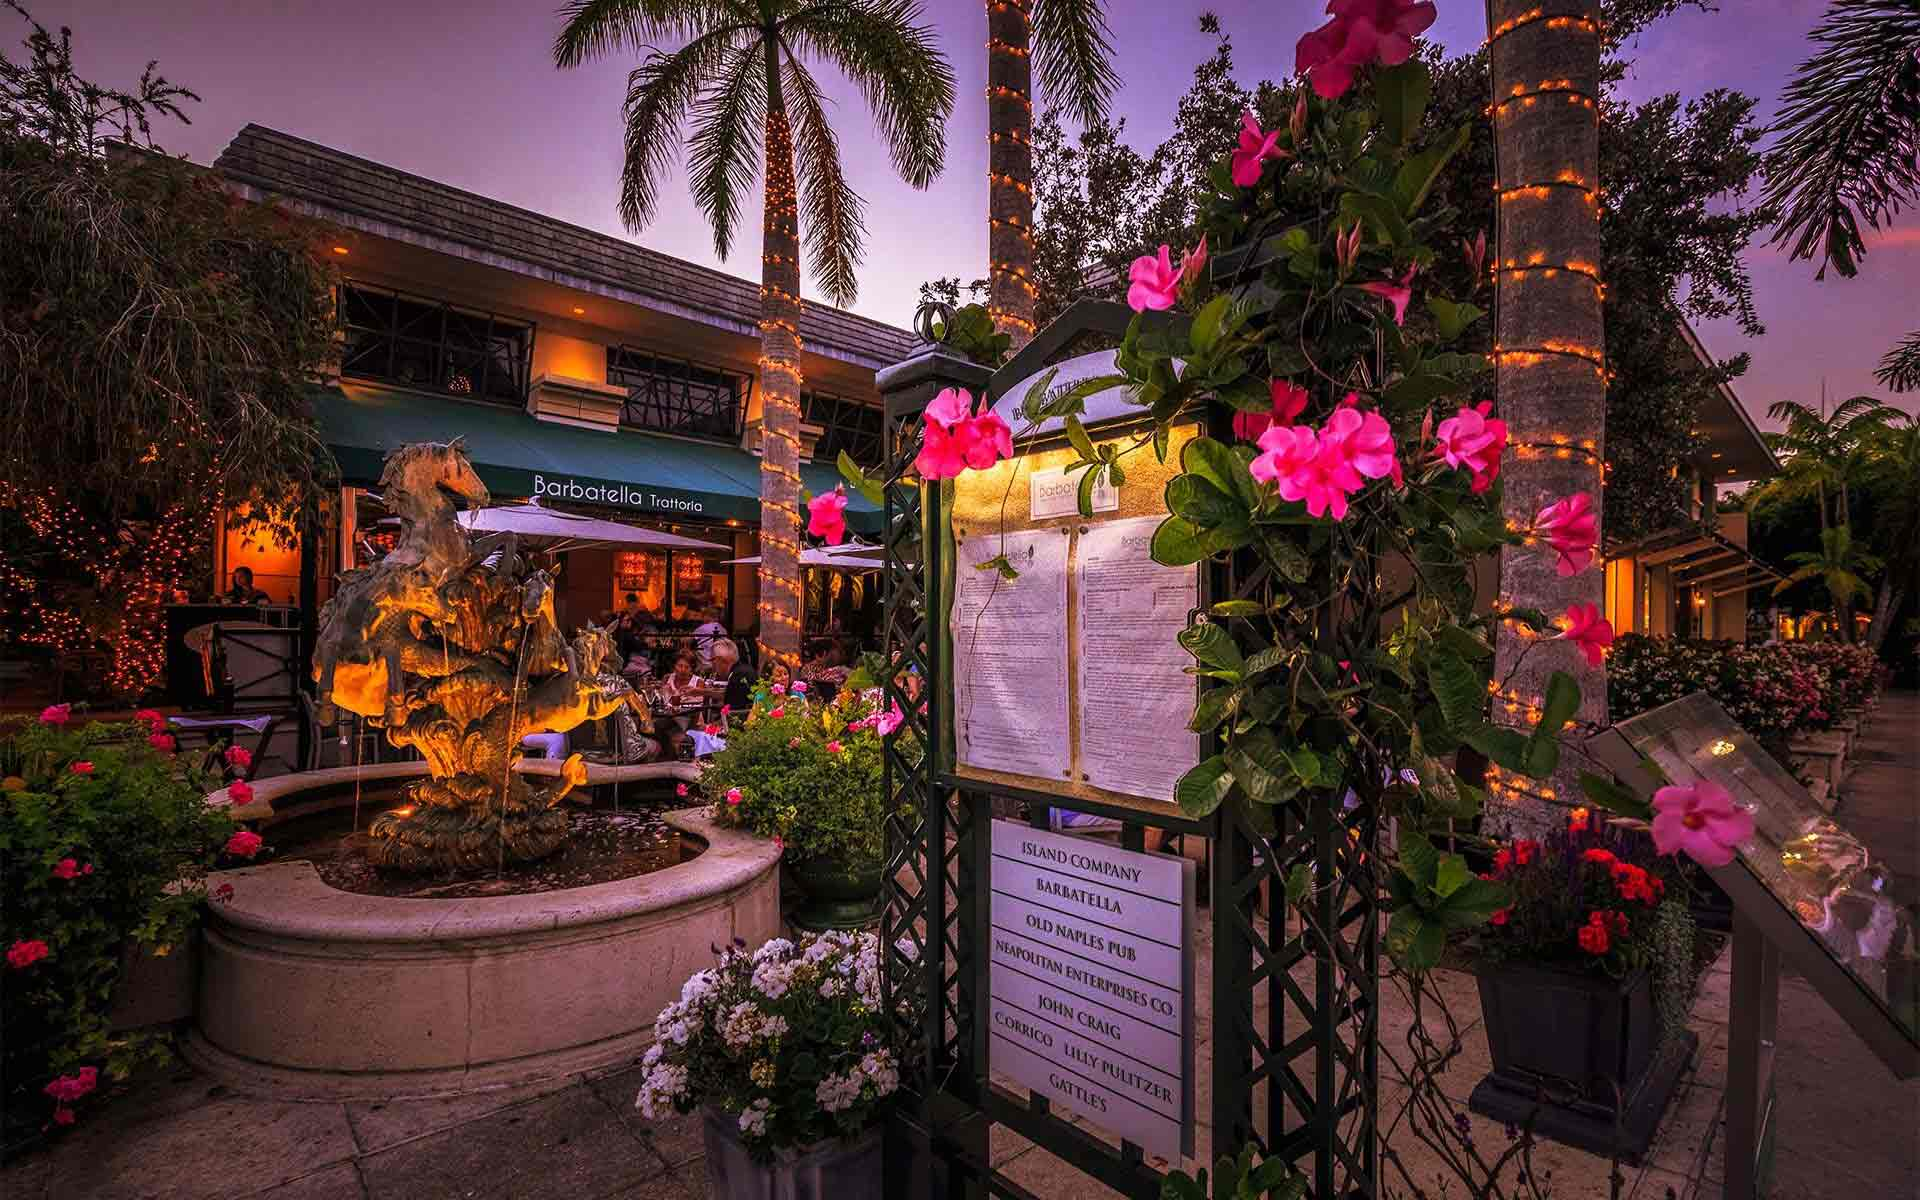 Barbatella Fountain Courtyard